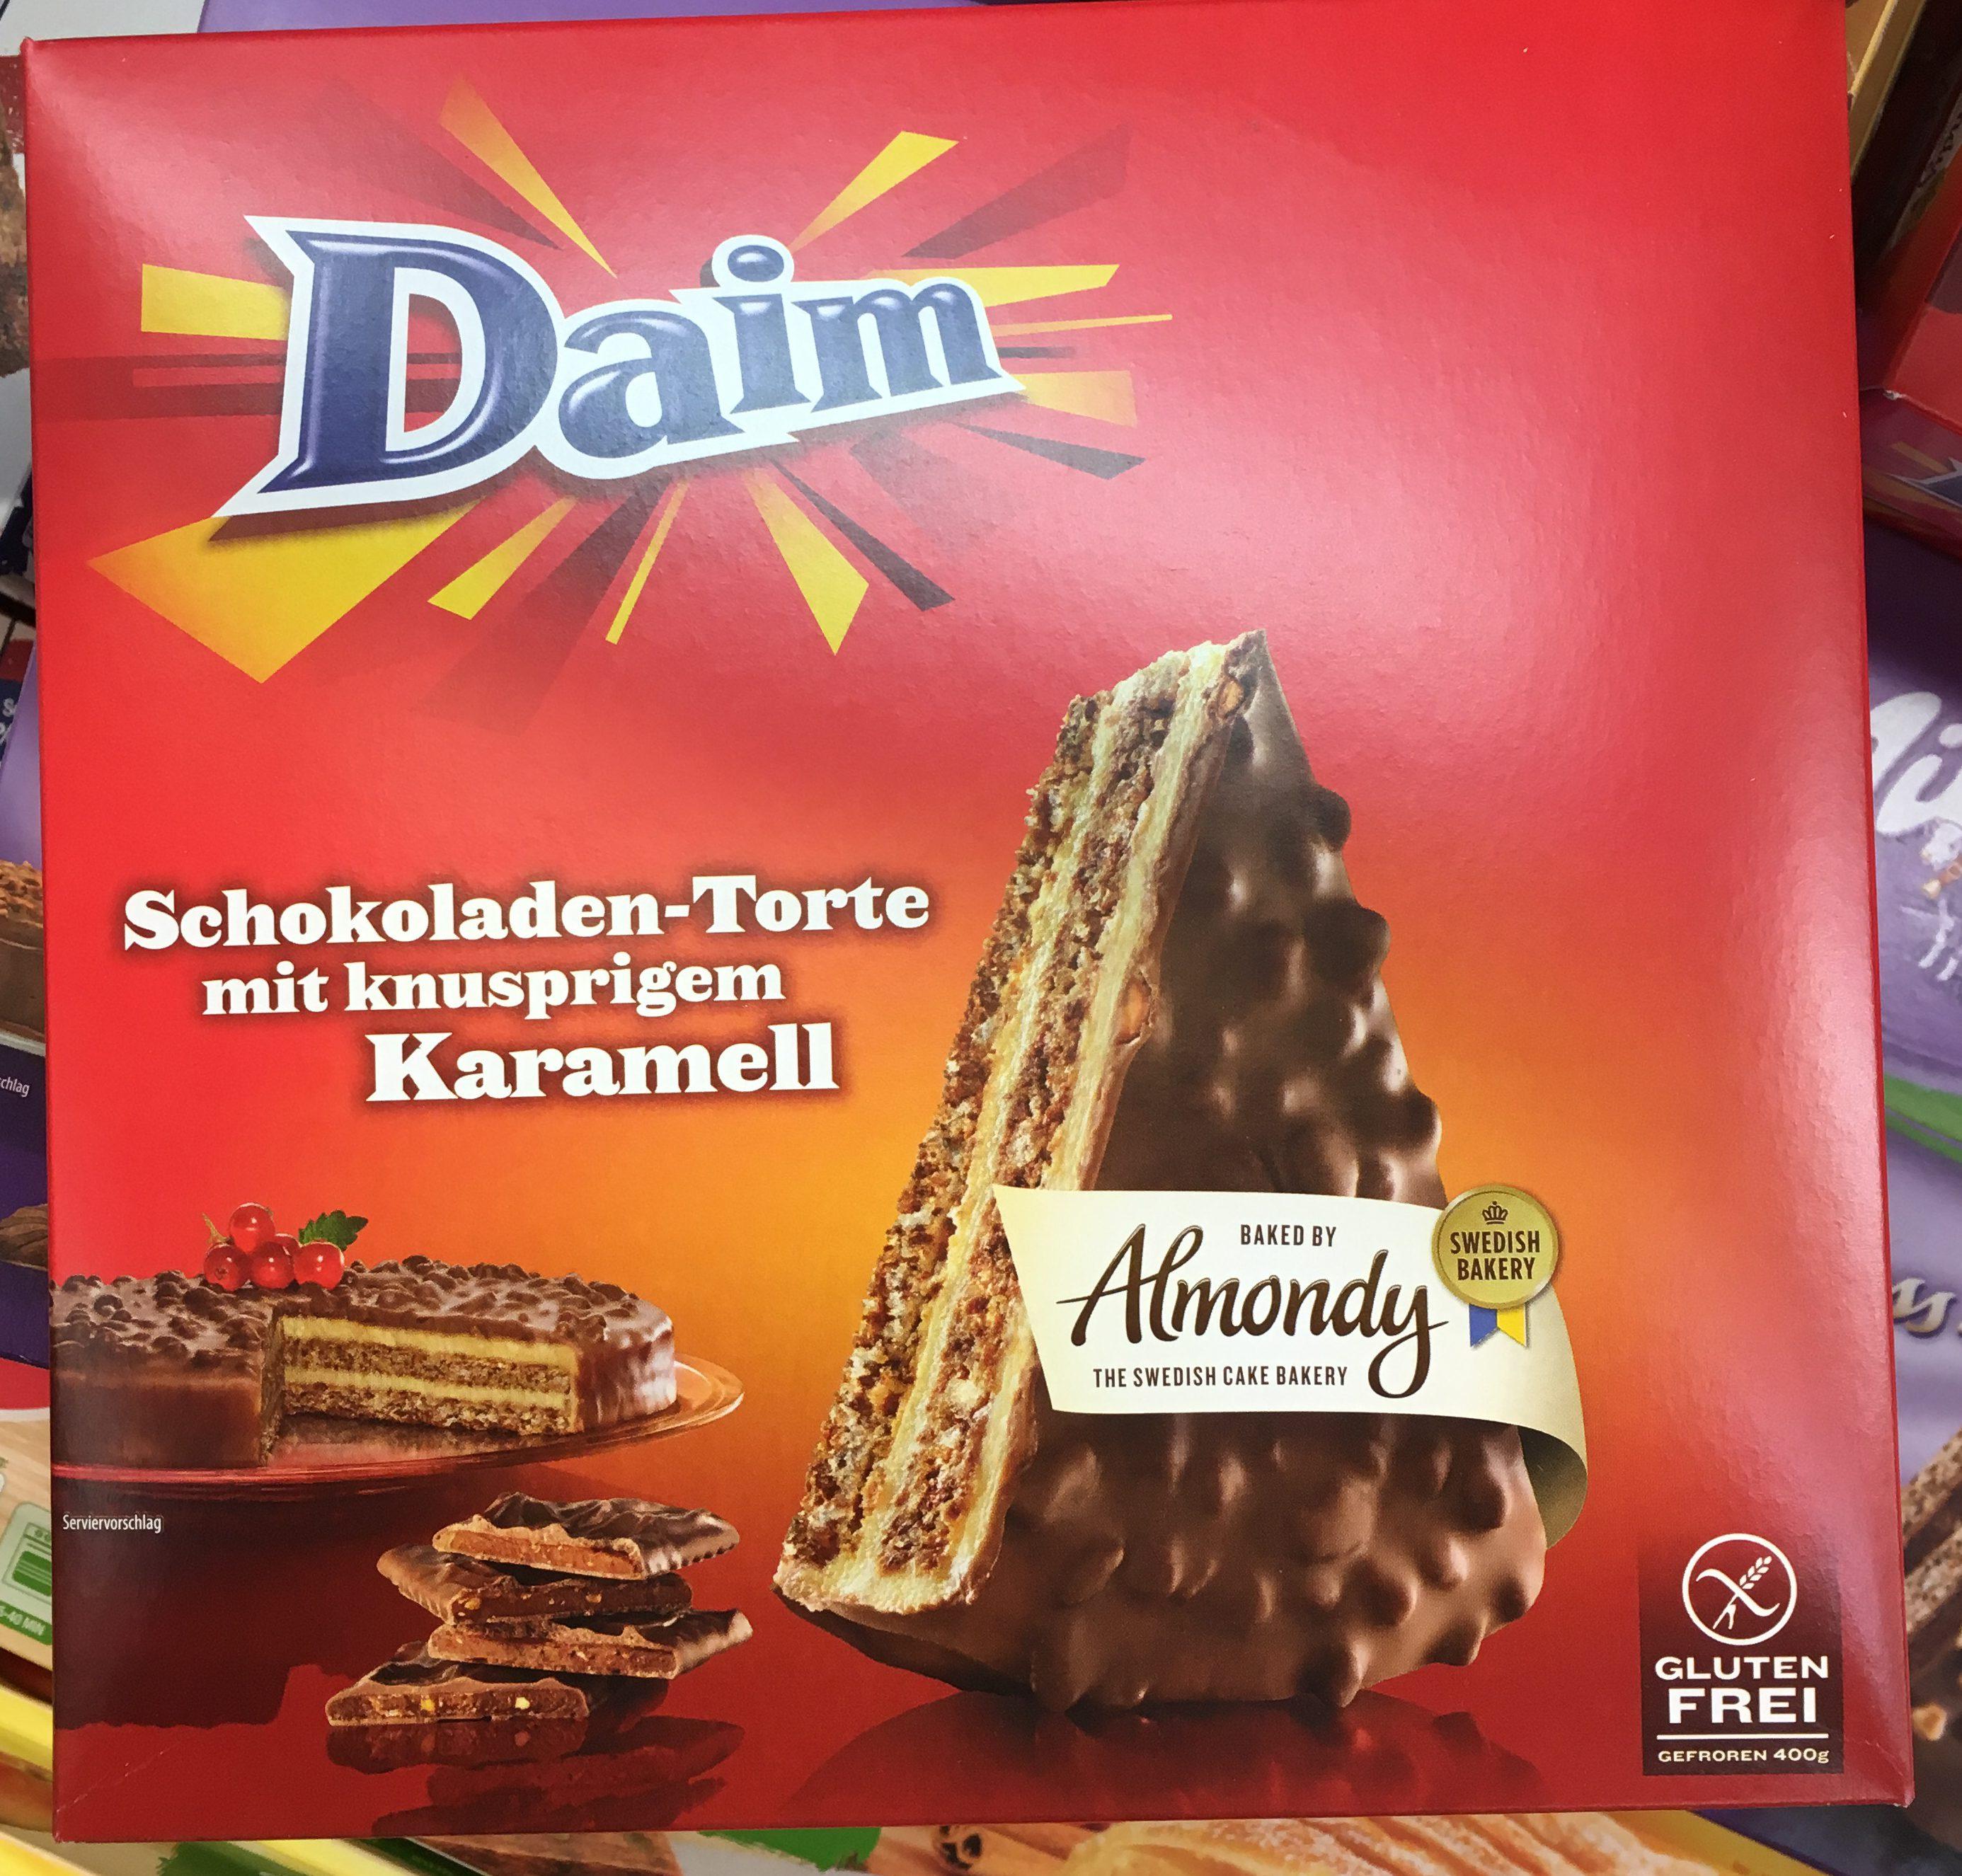 Daim Almondy Schokoladentorte  Naschkater